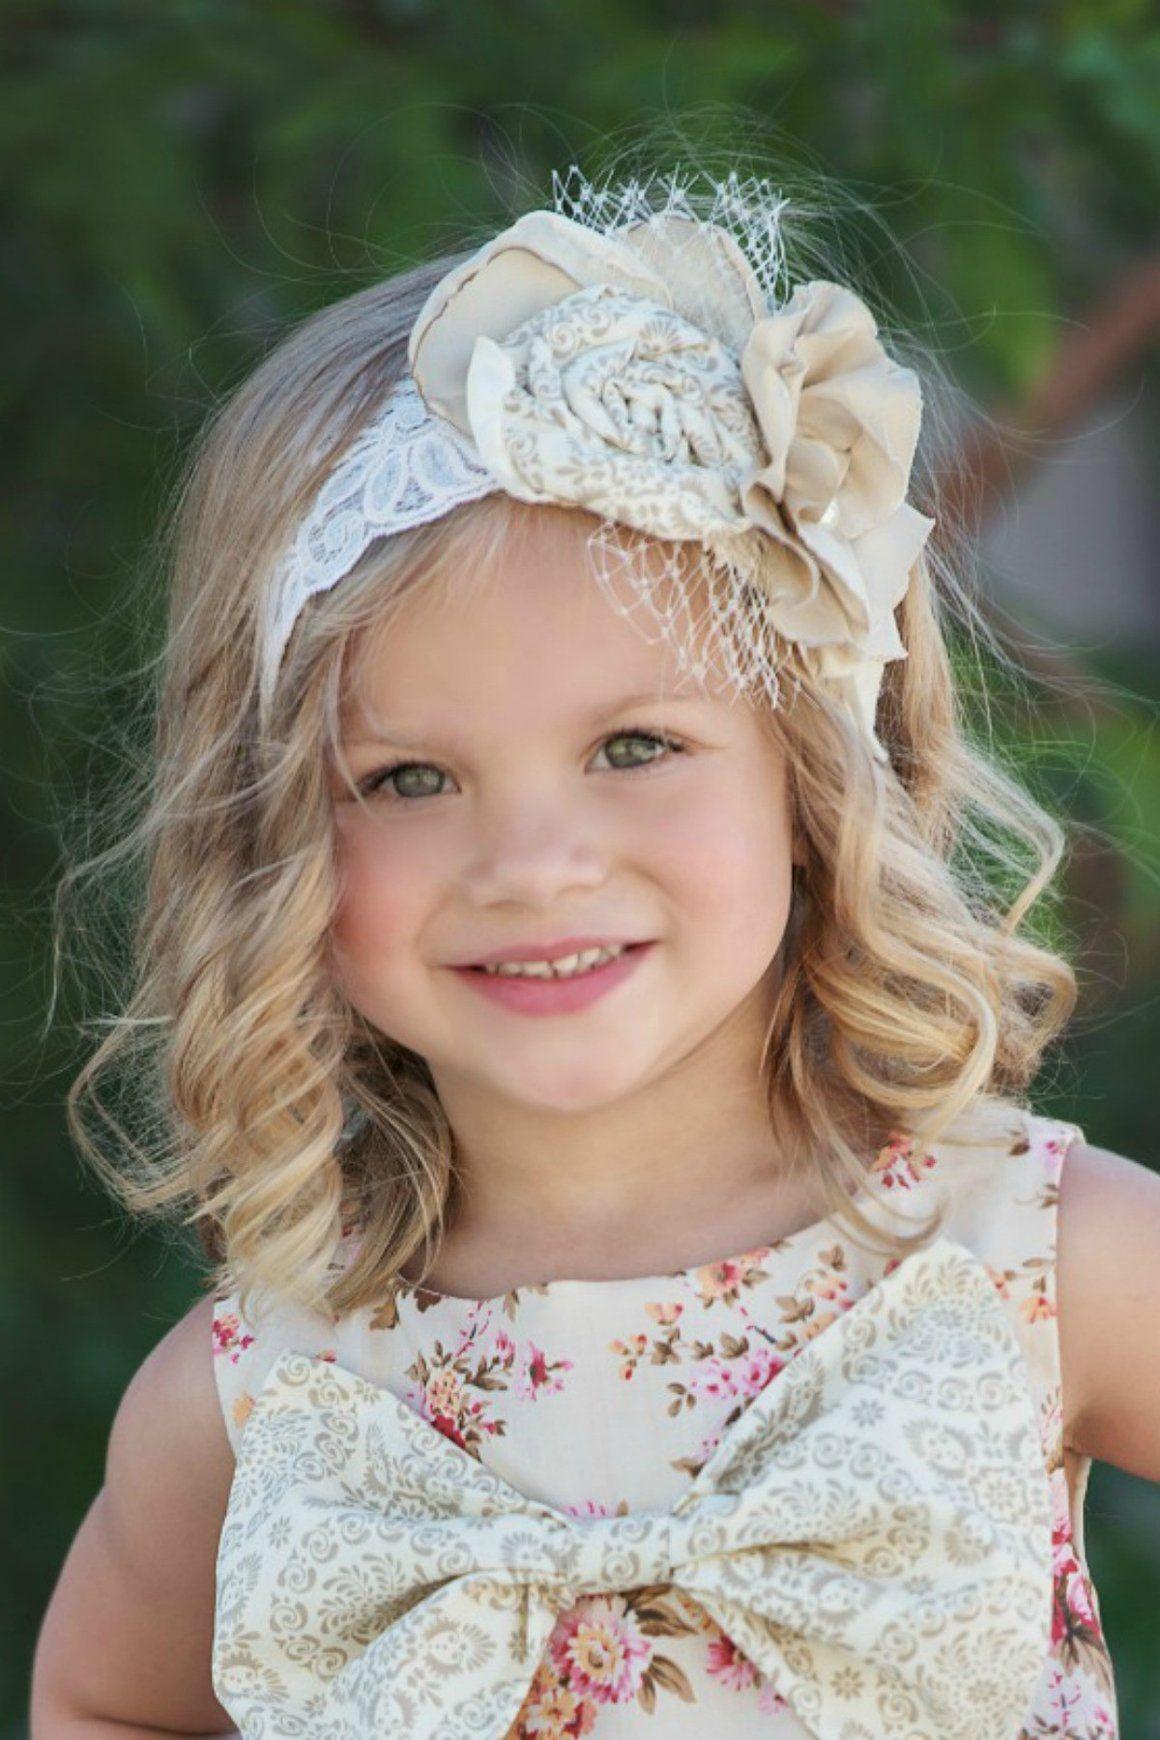 Carmella headbandcream flower girl dresses headbands